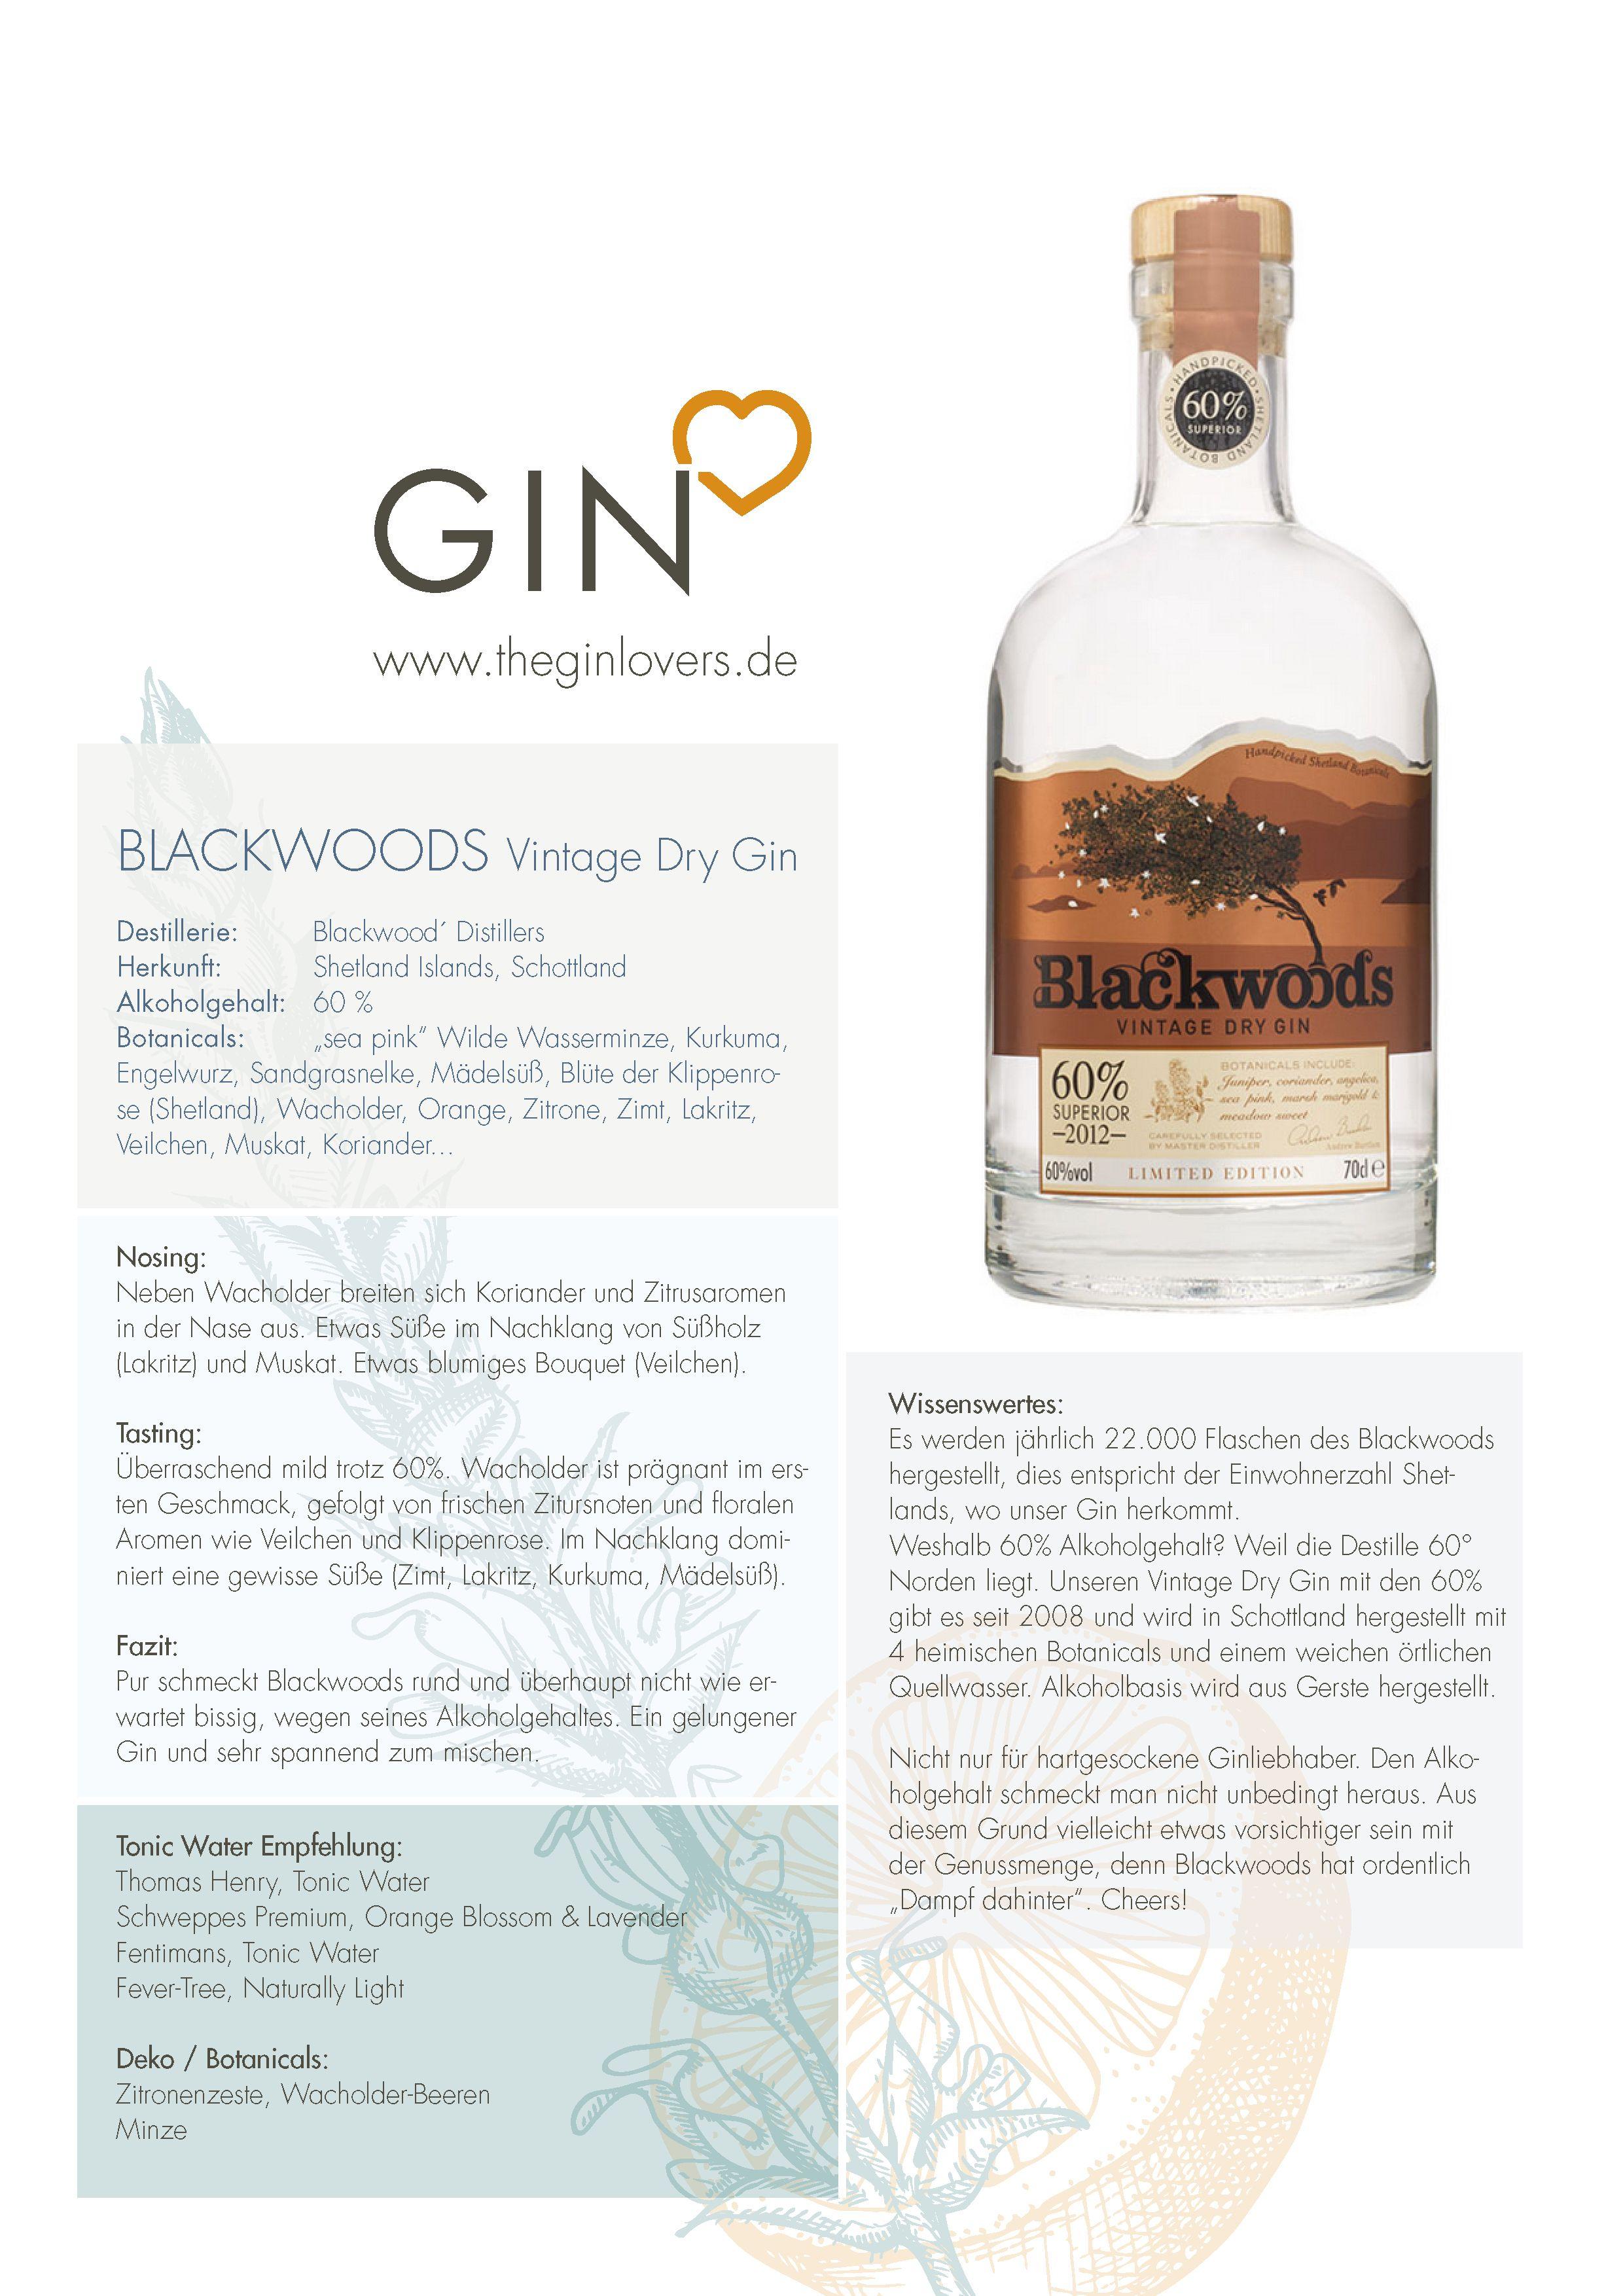 Blackwood S Vintage Dry Gin 60 Gin Review Lakritz Alkoholgehalt Minze